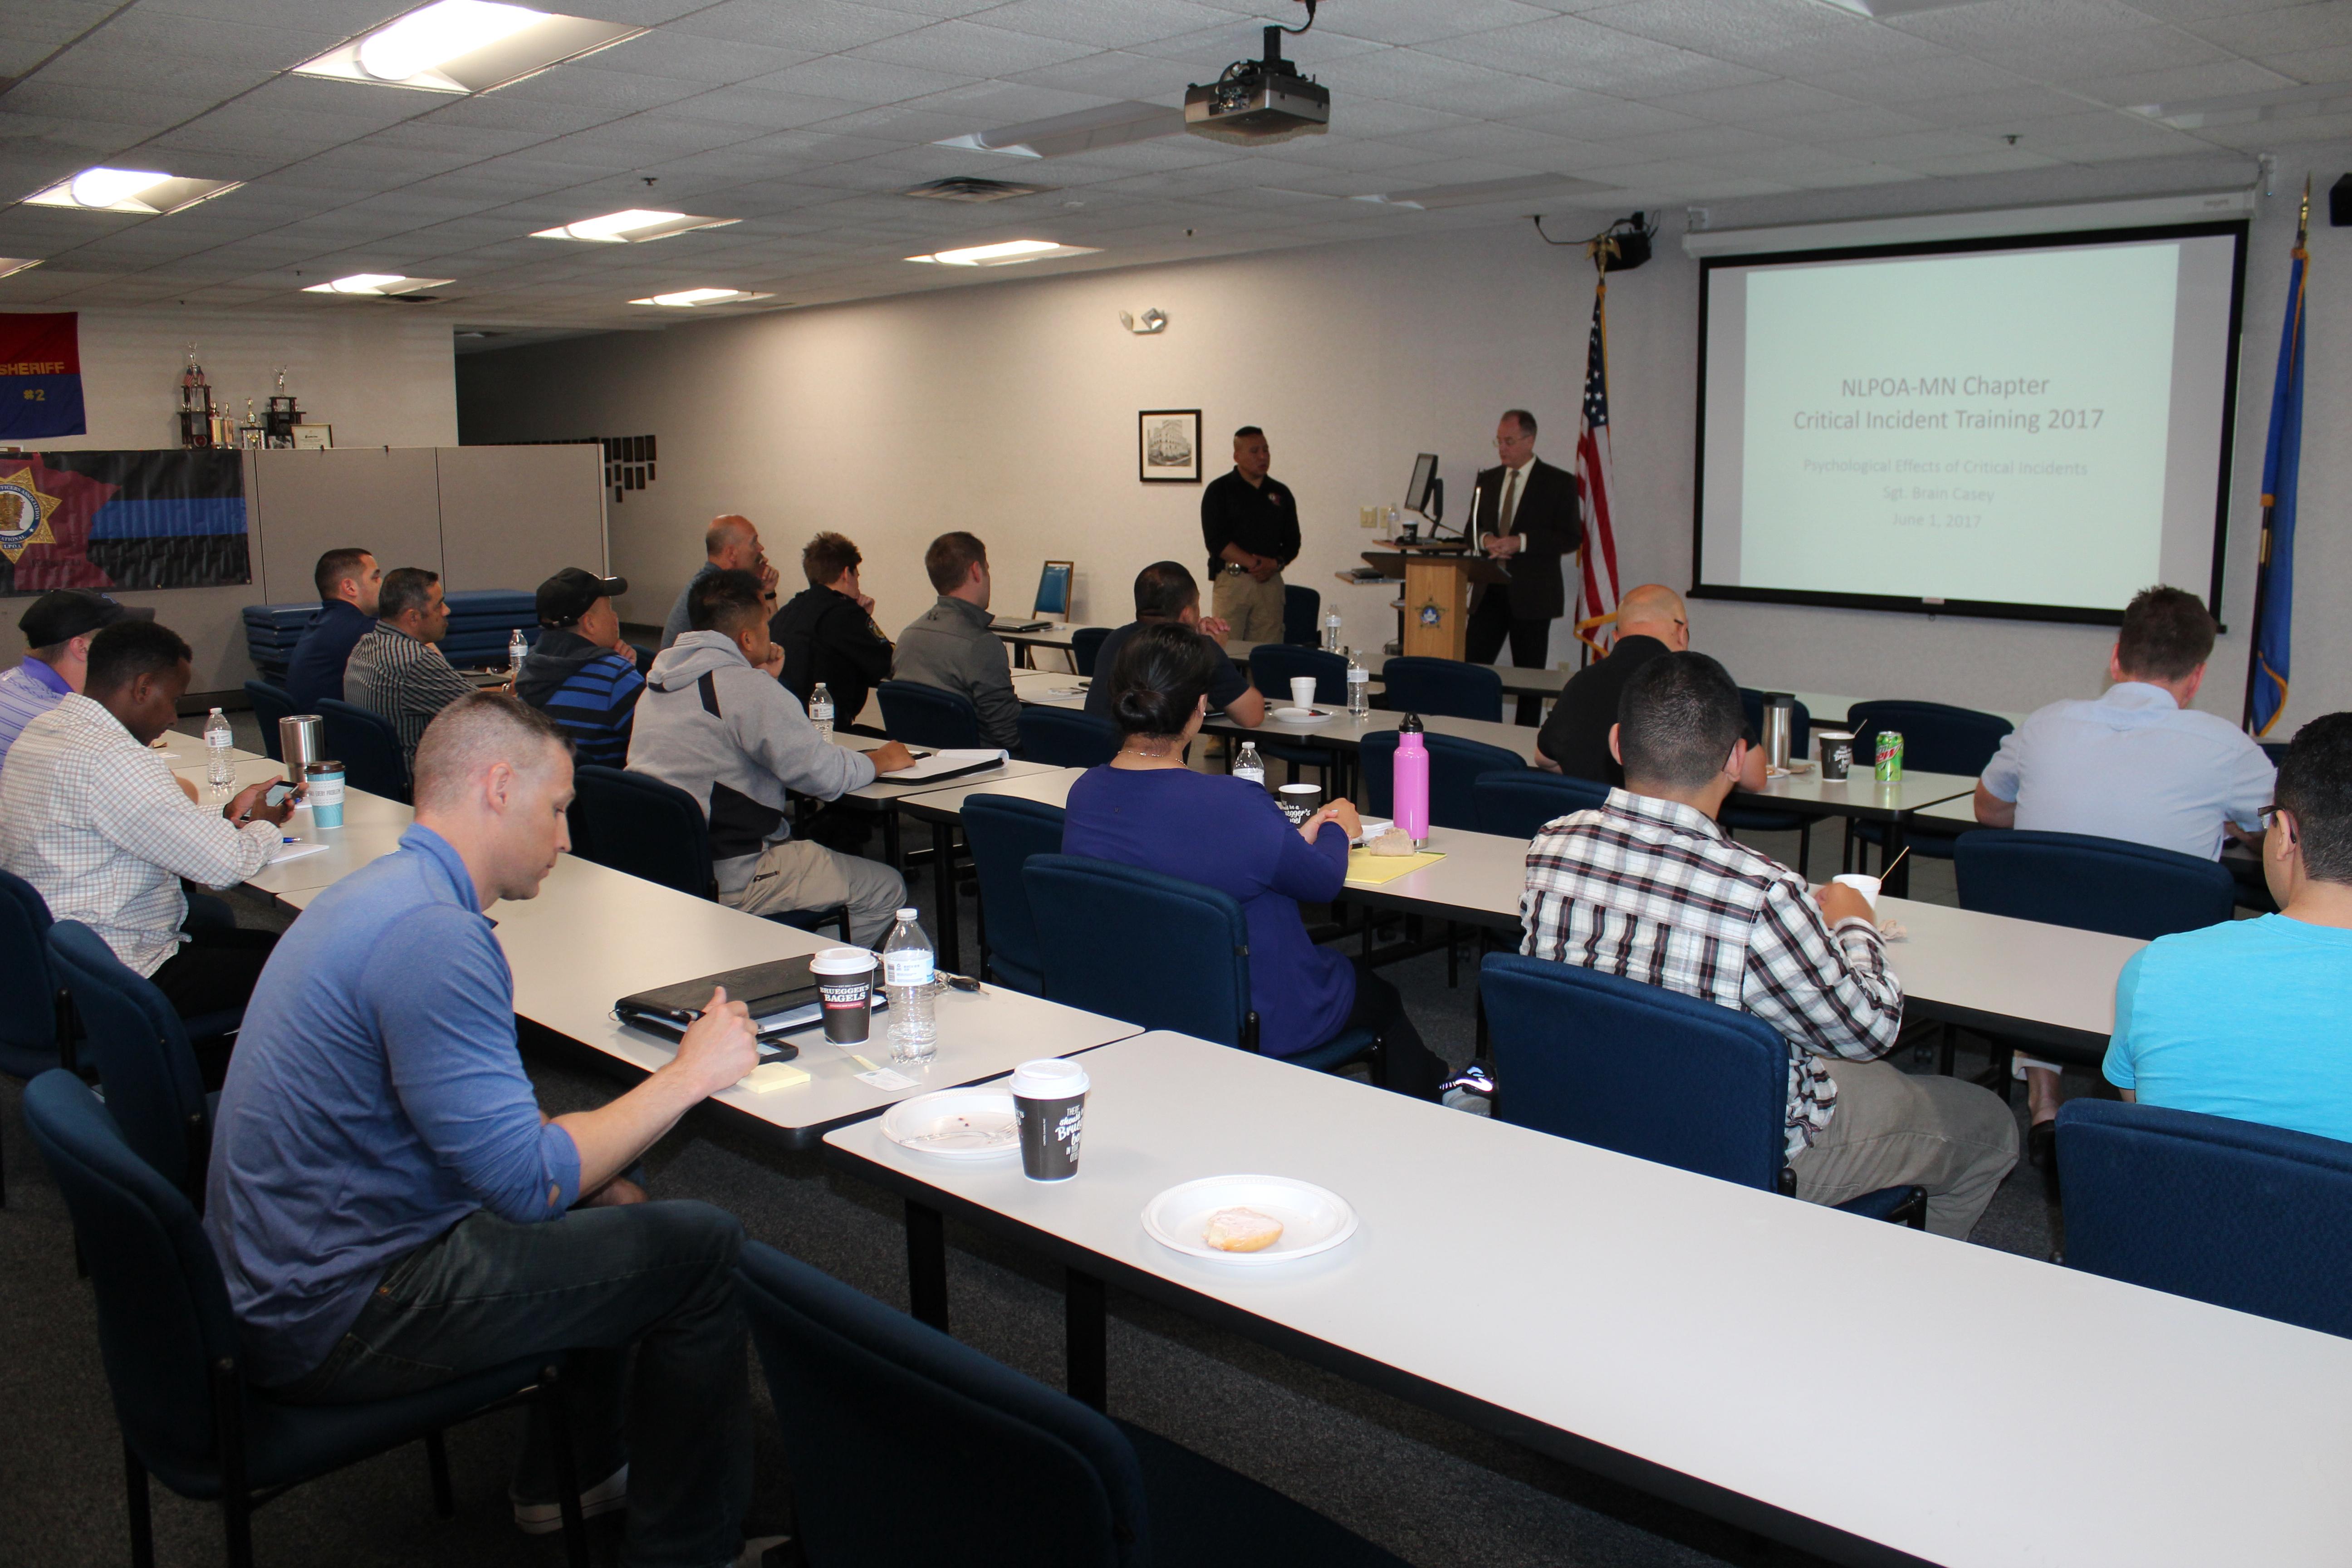 2017 Critical Incidents Training